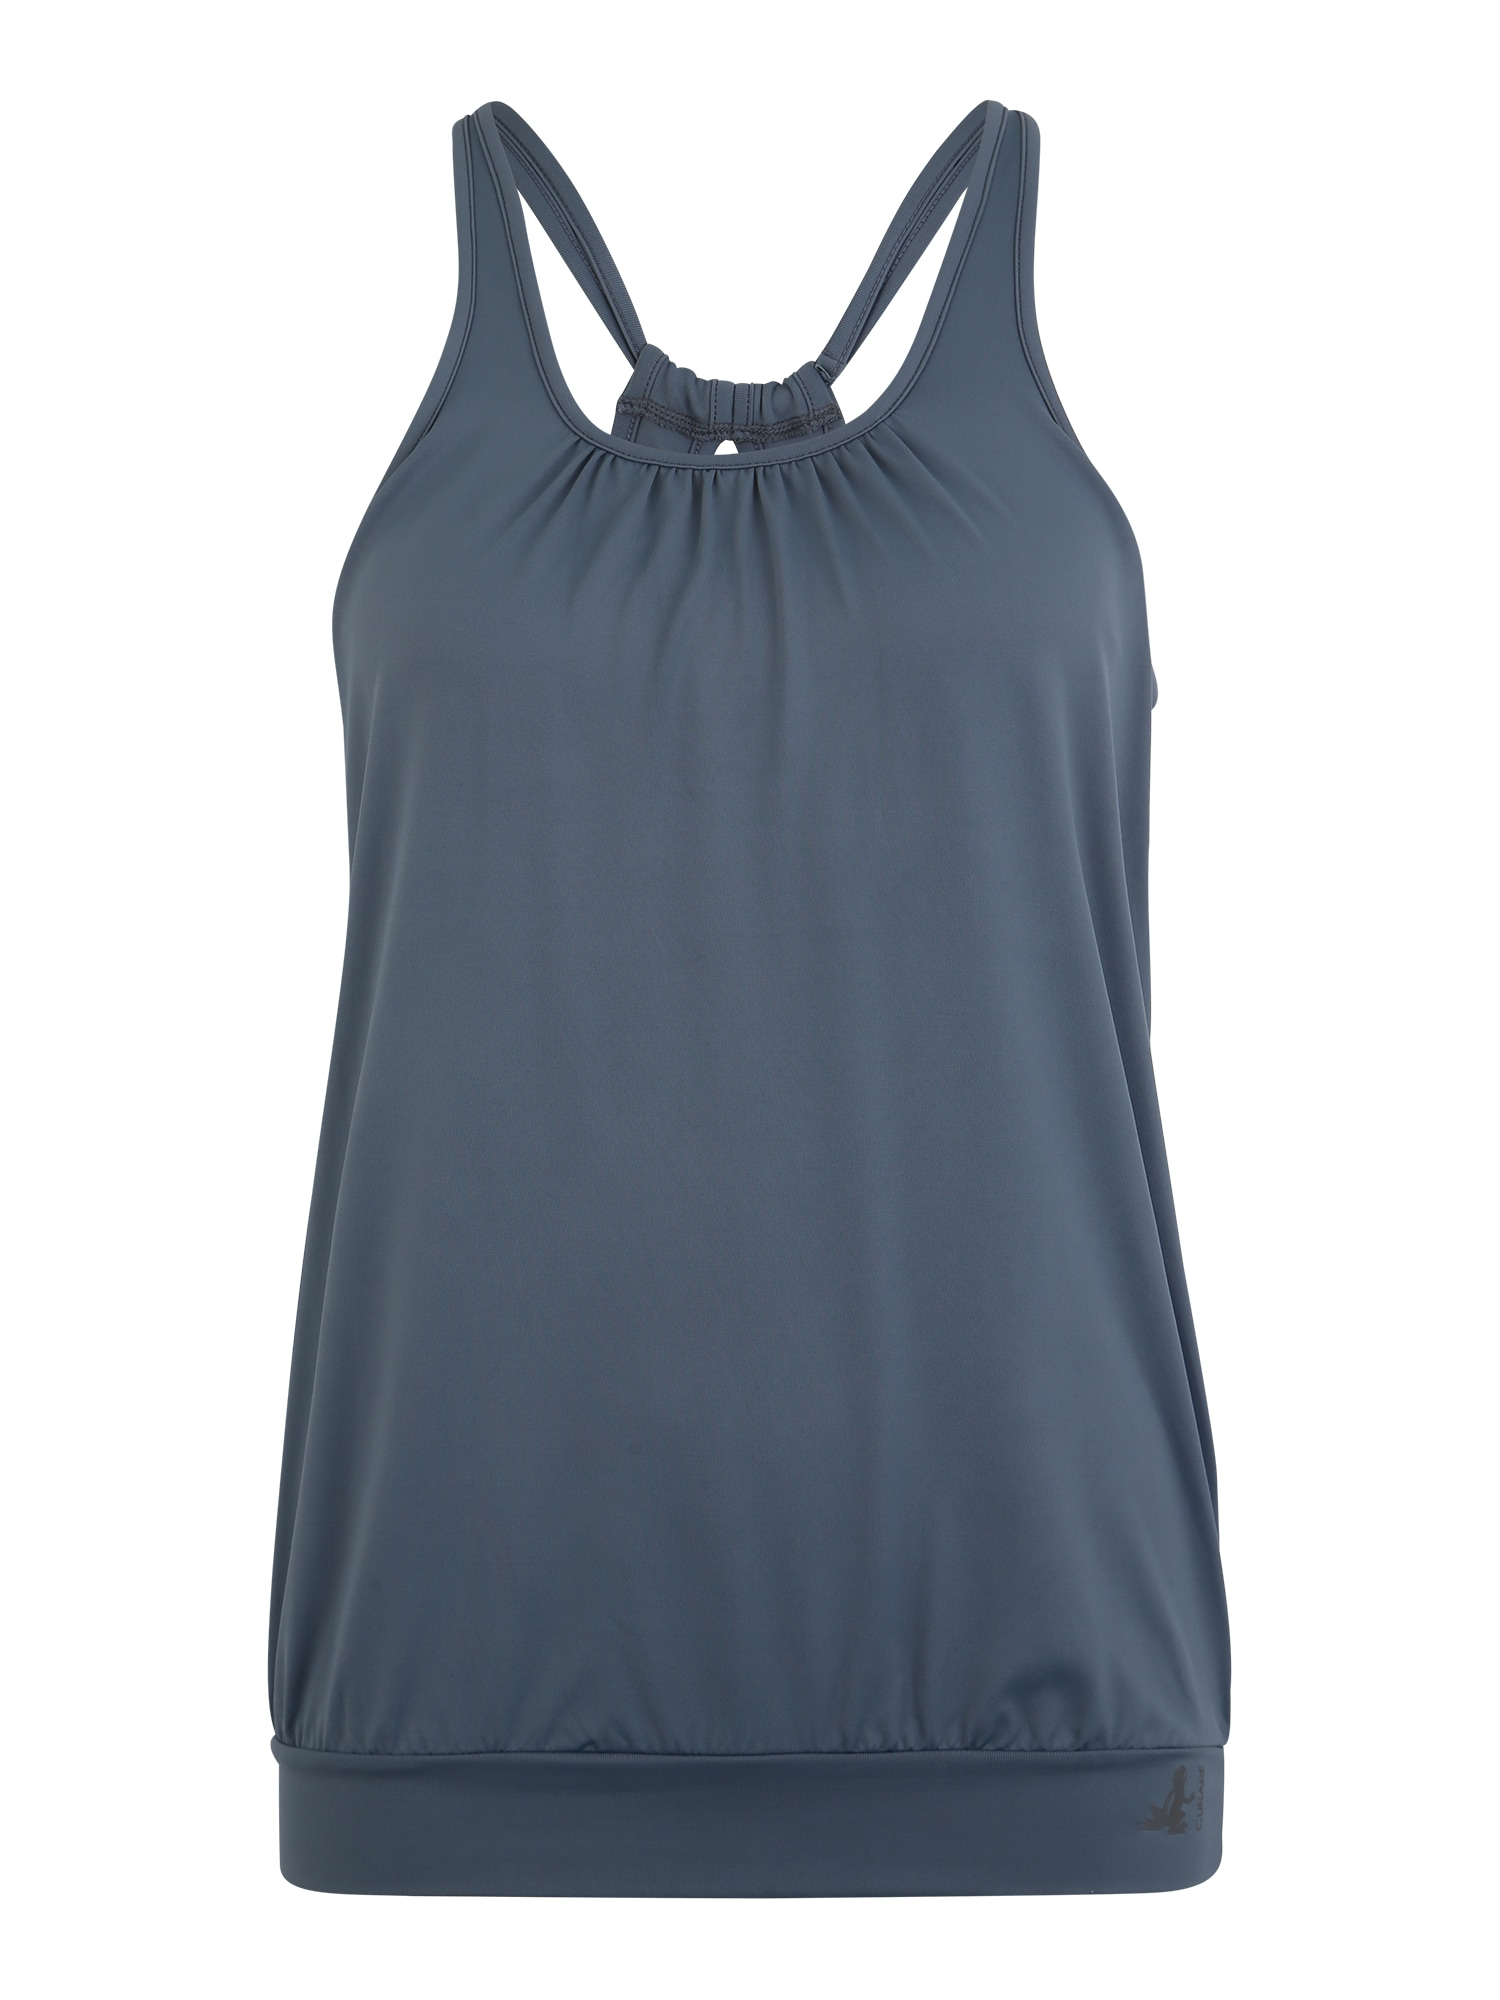 Sportovní top šedá CURARE Yogawear